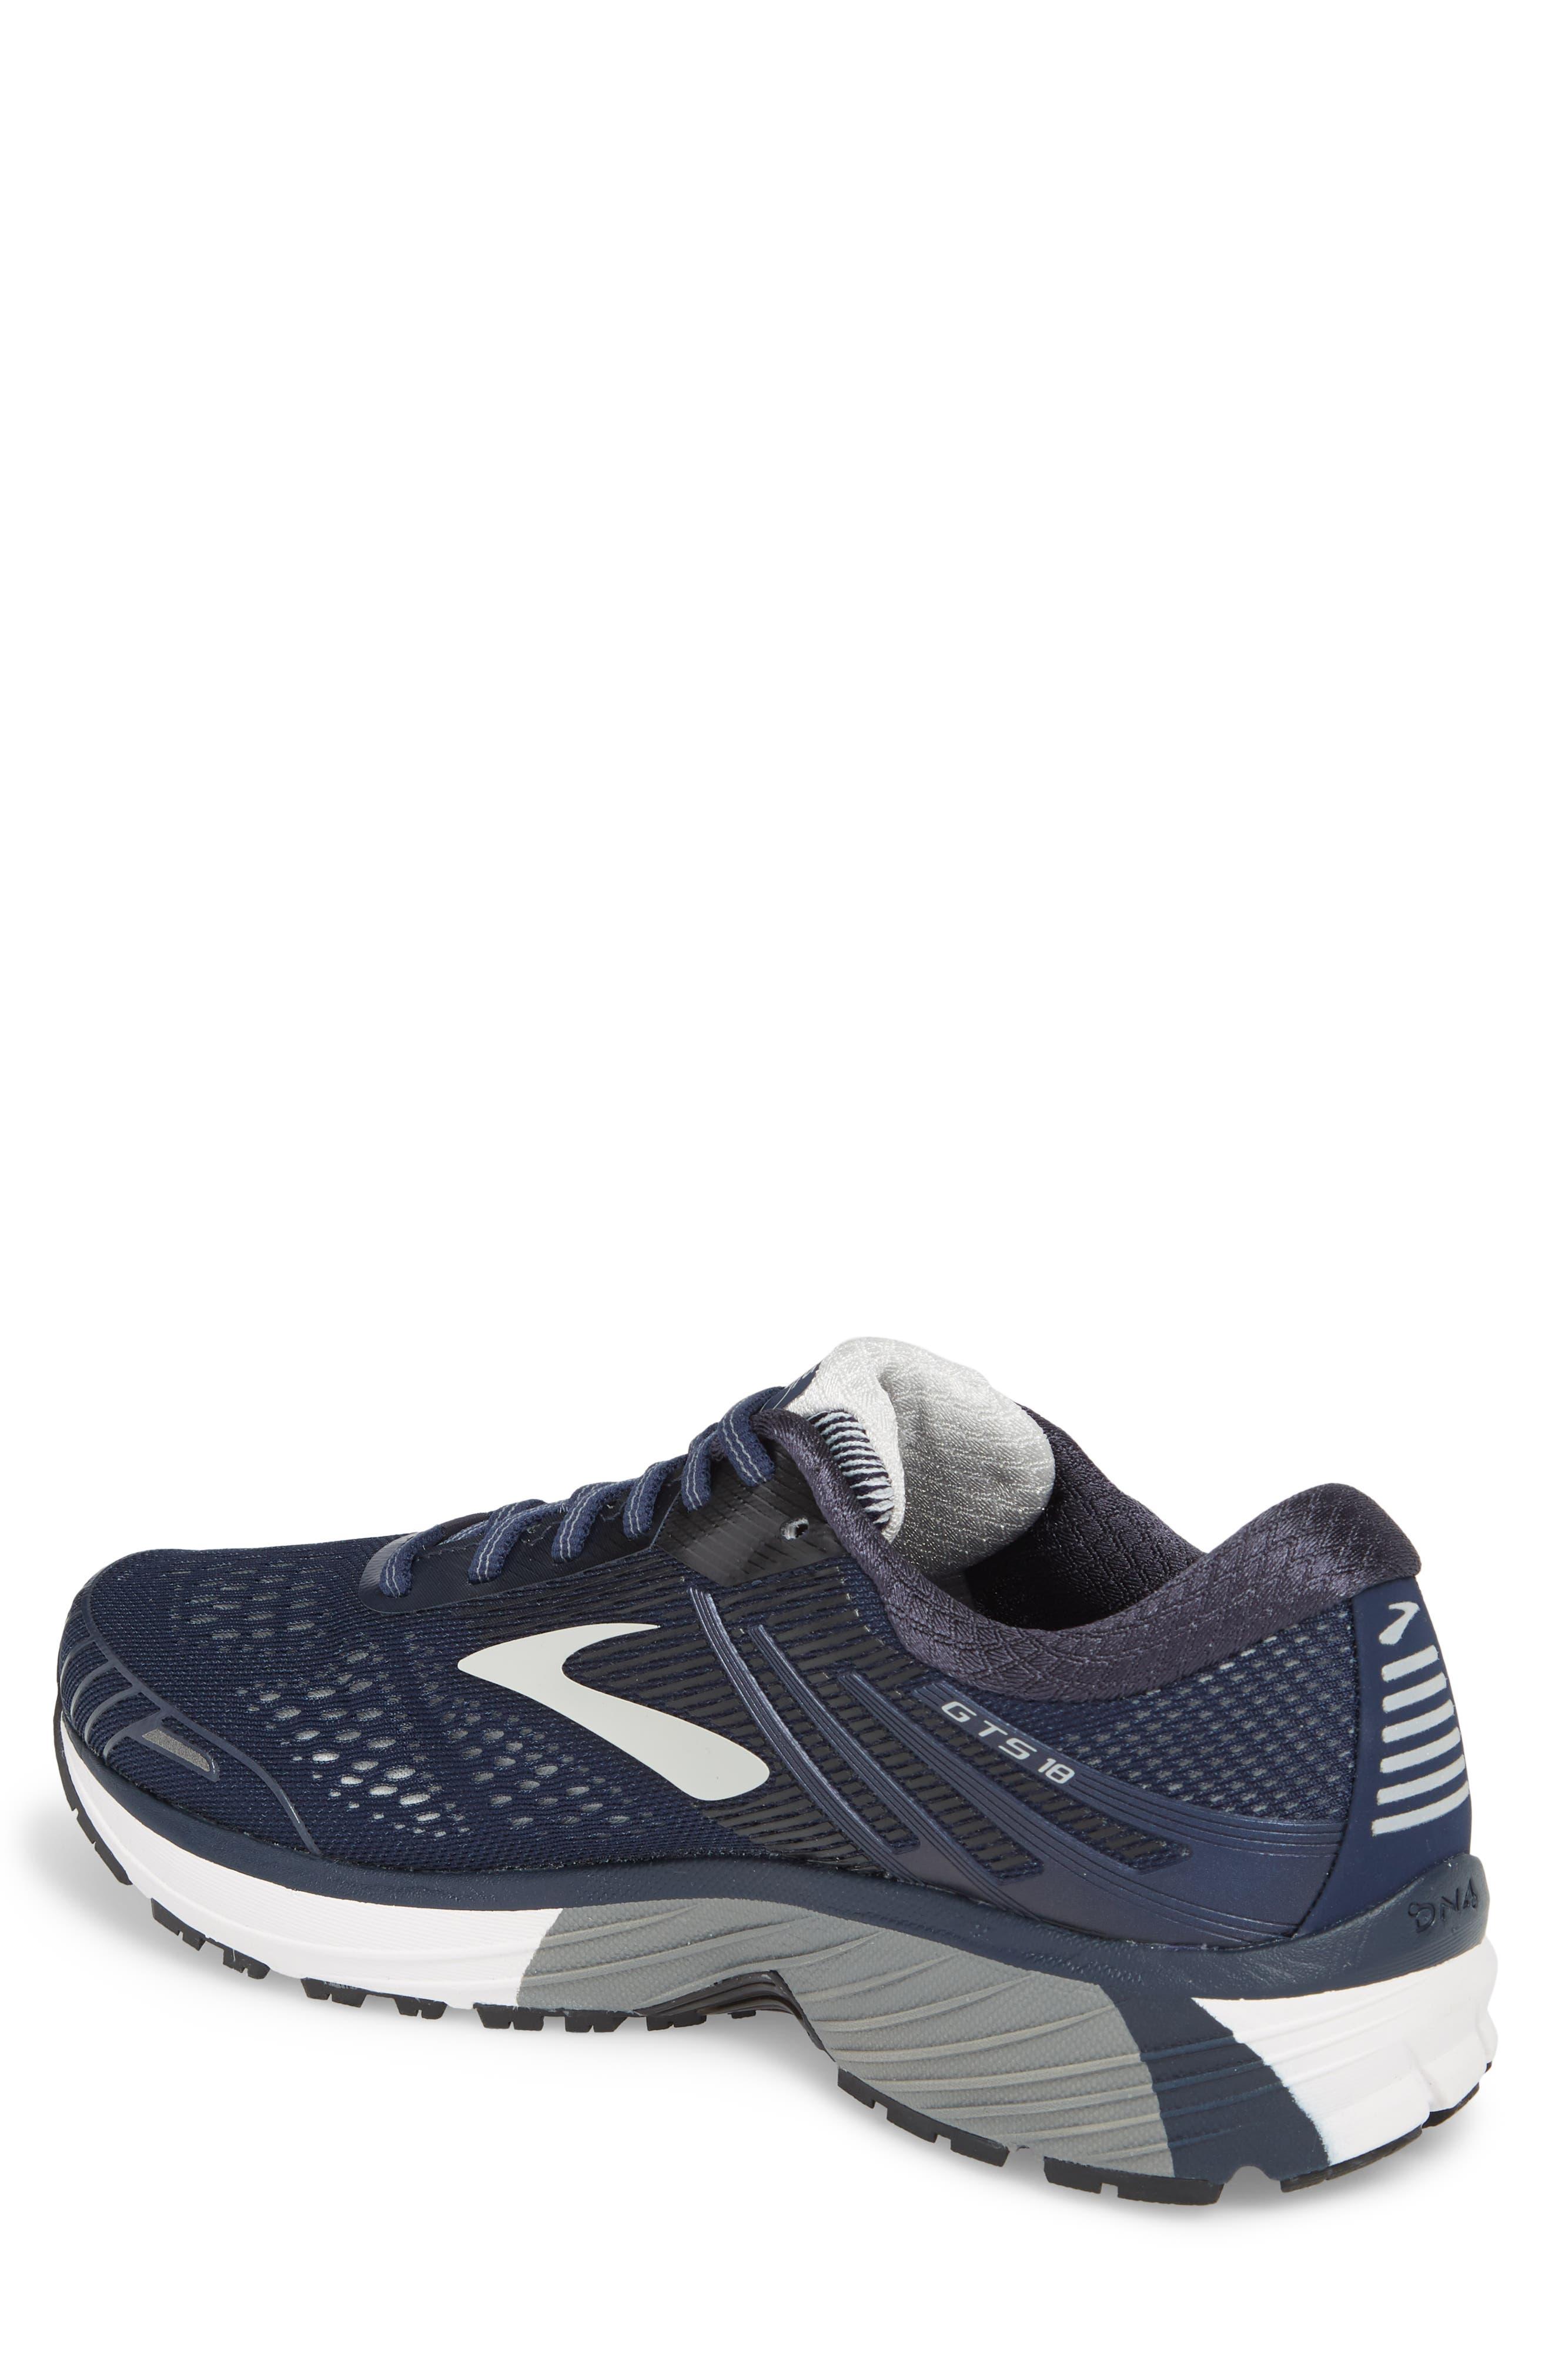 Adrenaline GTS 18 Running Shoe,                             Alternate thumbnail 2, color,                             Navy/ Grey/ Black